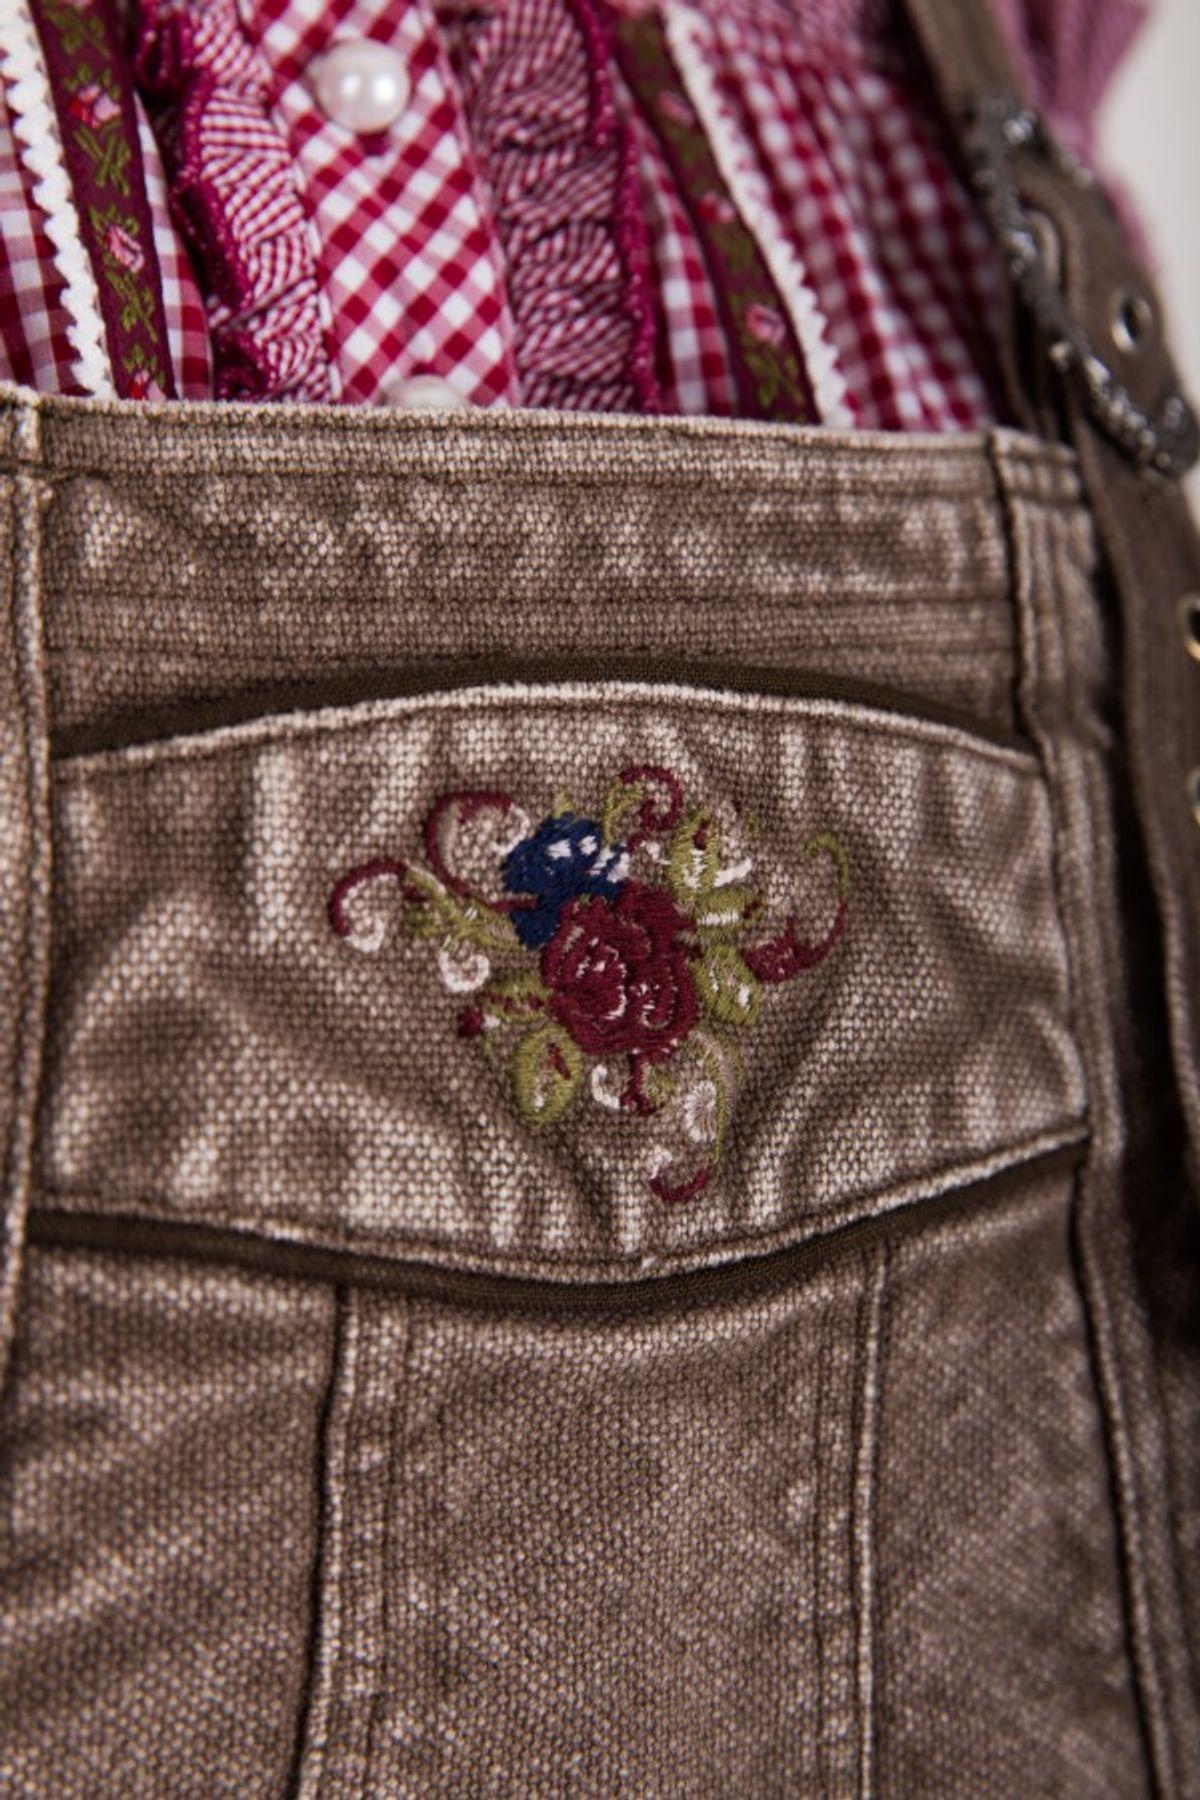 Krüger - Damen Trachtenlatzhose in braun/rot (33362-790) oder braun/blau (33362-733), Fleur De Rose Rot  – Bild 4